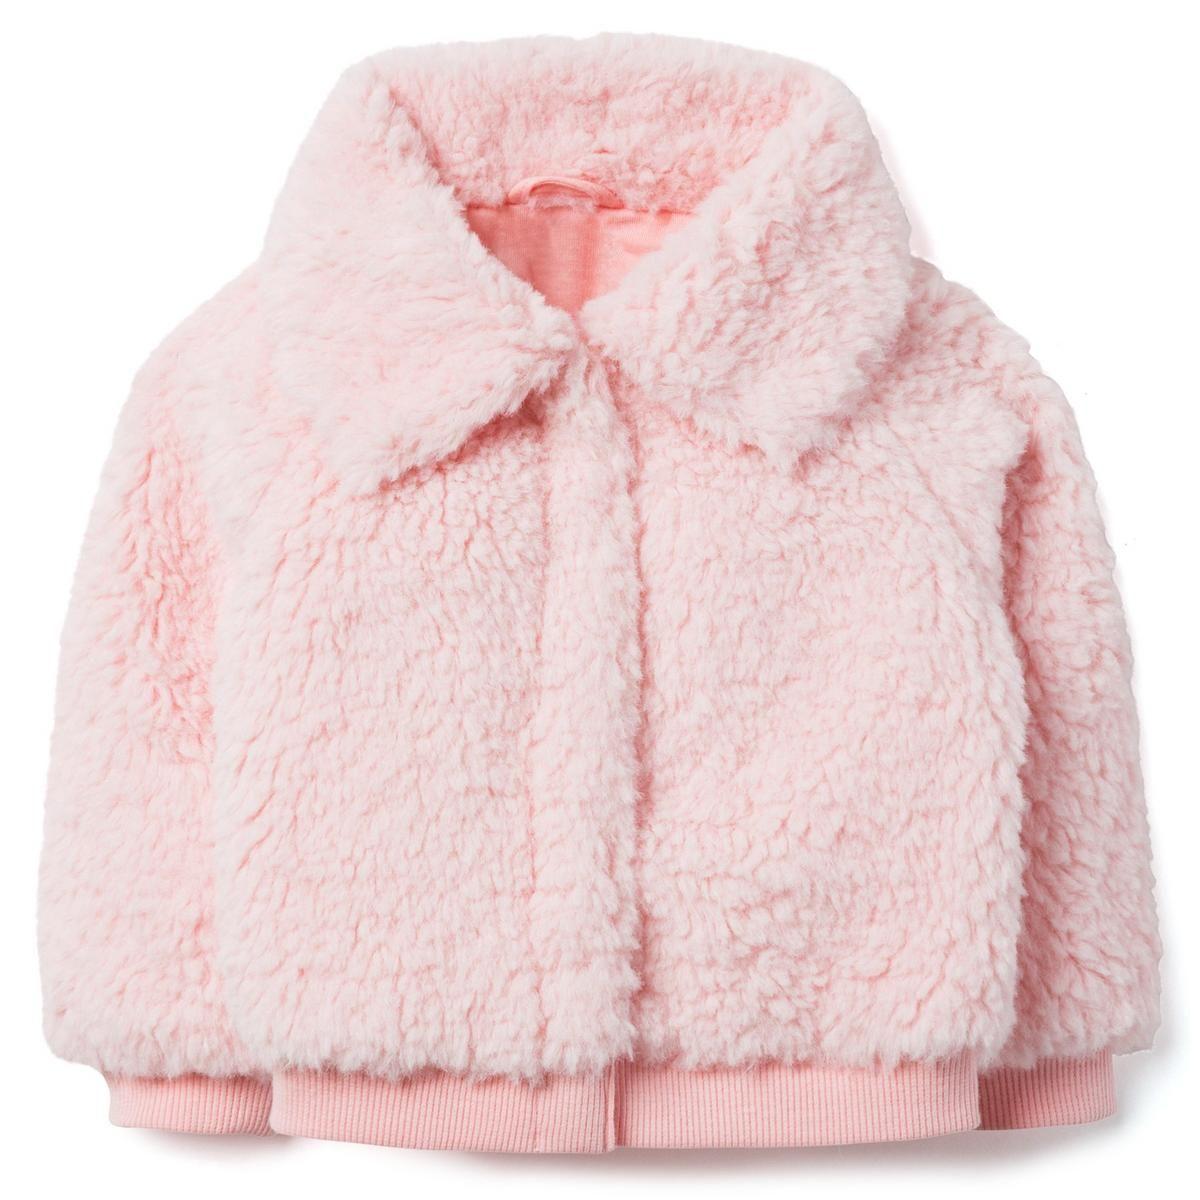 Jack And Janie Fur Cuff Sweater: Jackets, Pink Jacket, Janie, Jack